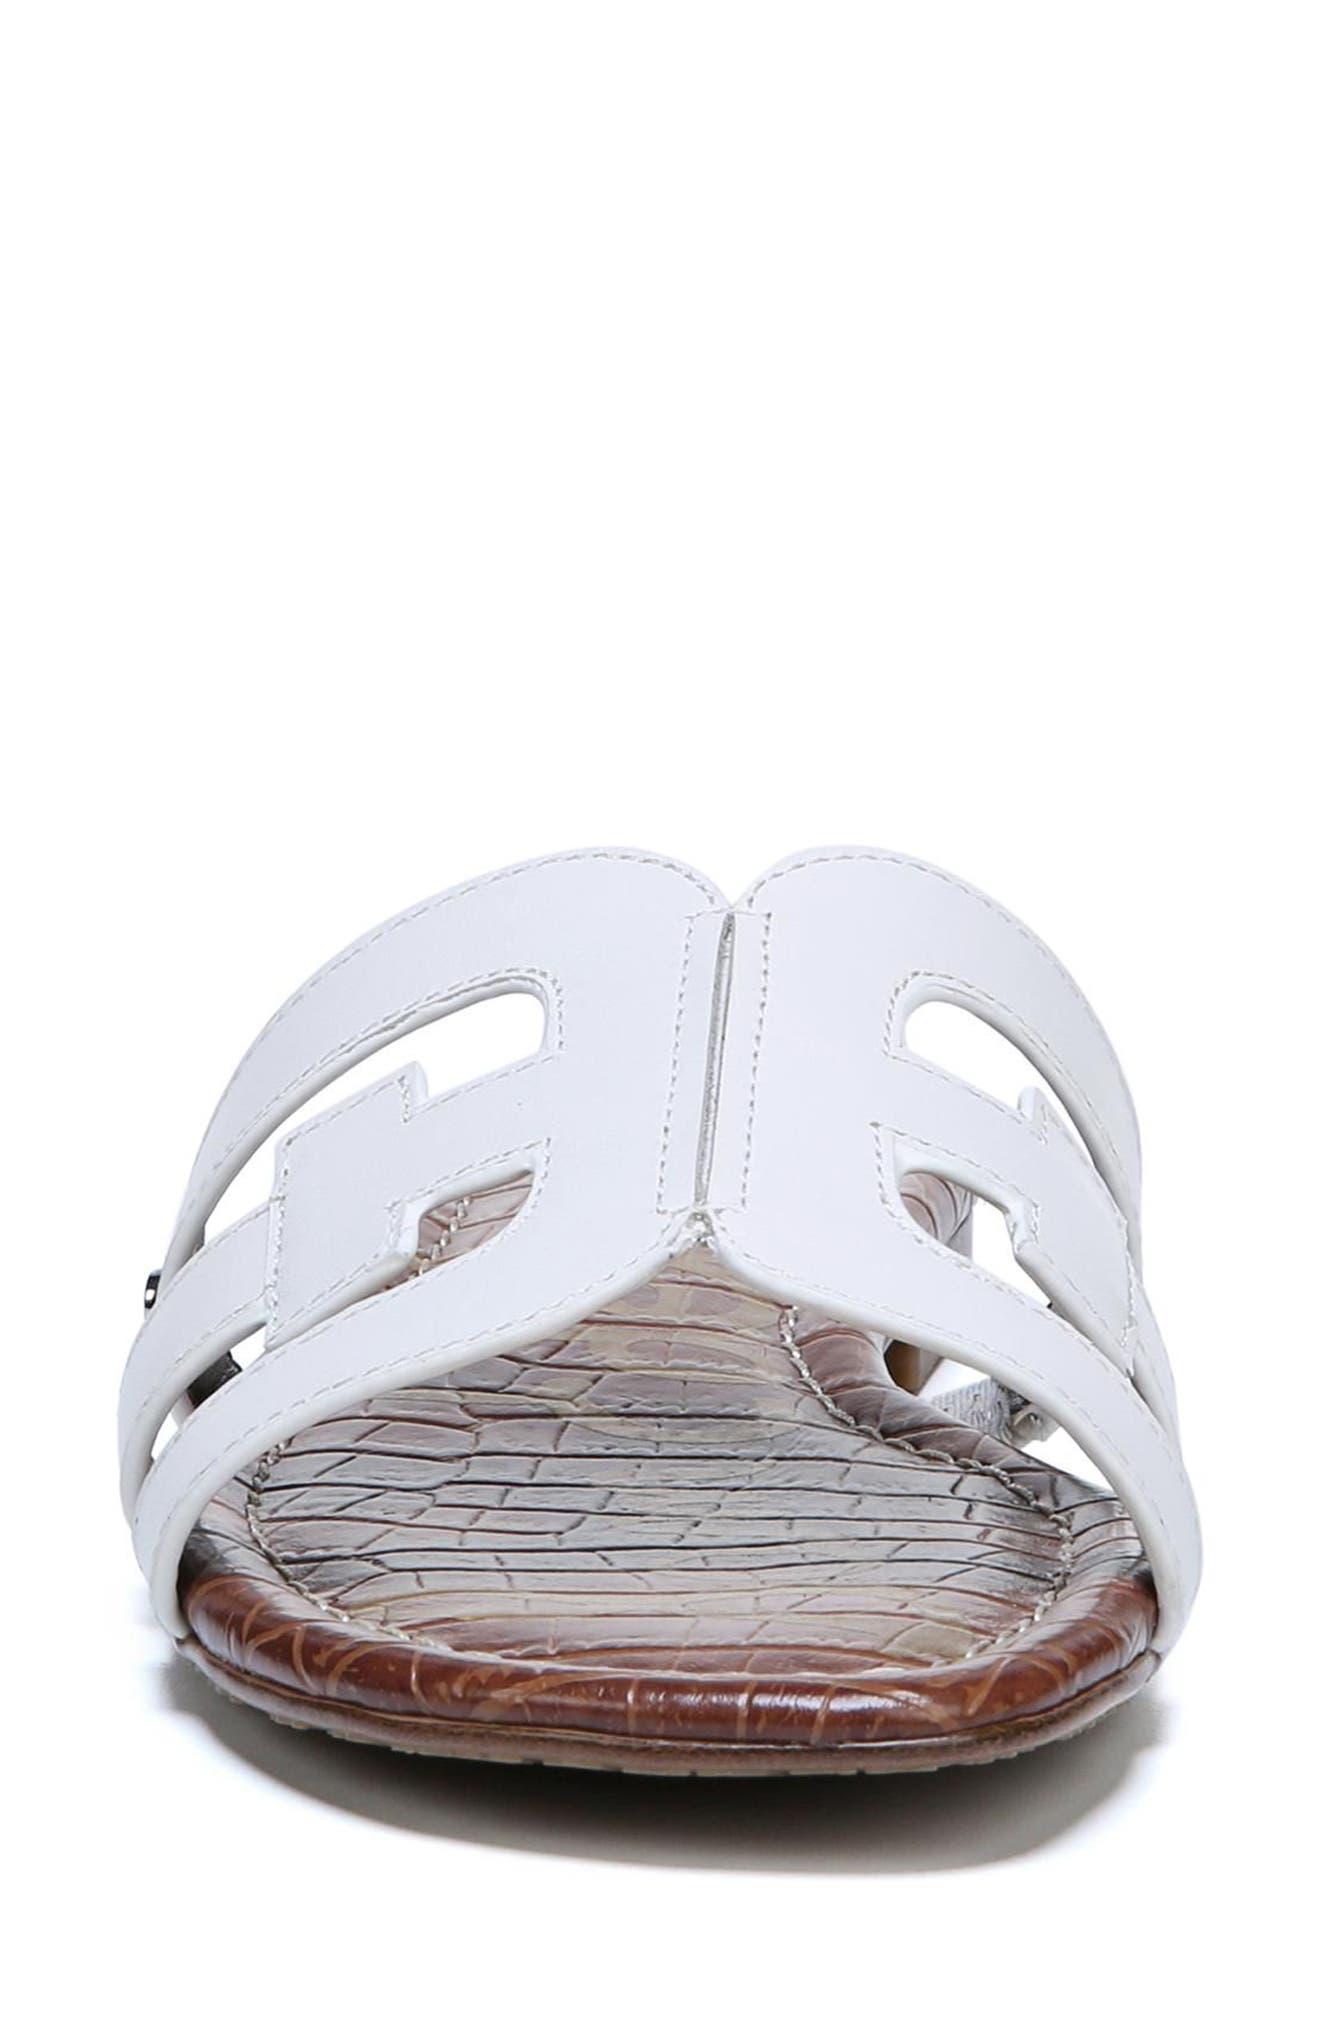 Bay Cutout Slide Sandal,                             Alternate thumbnail 4, color,                             Bright White Leather